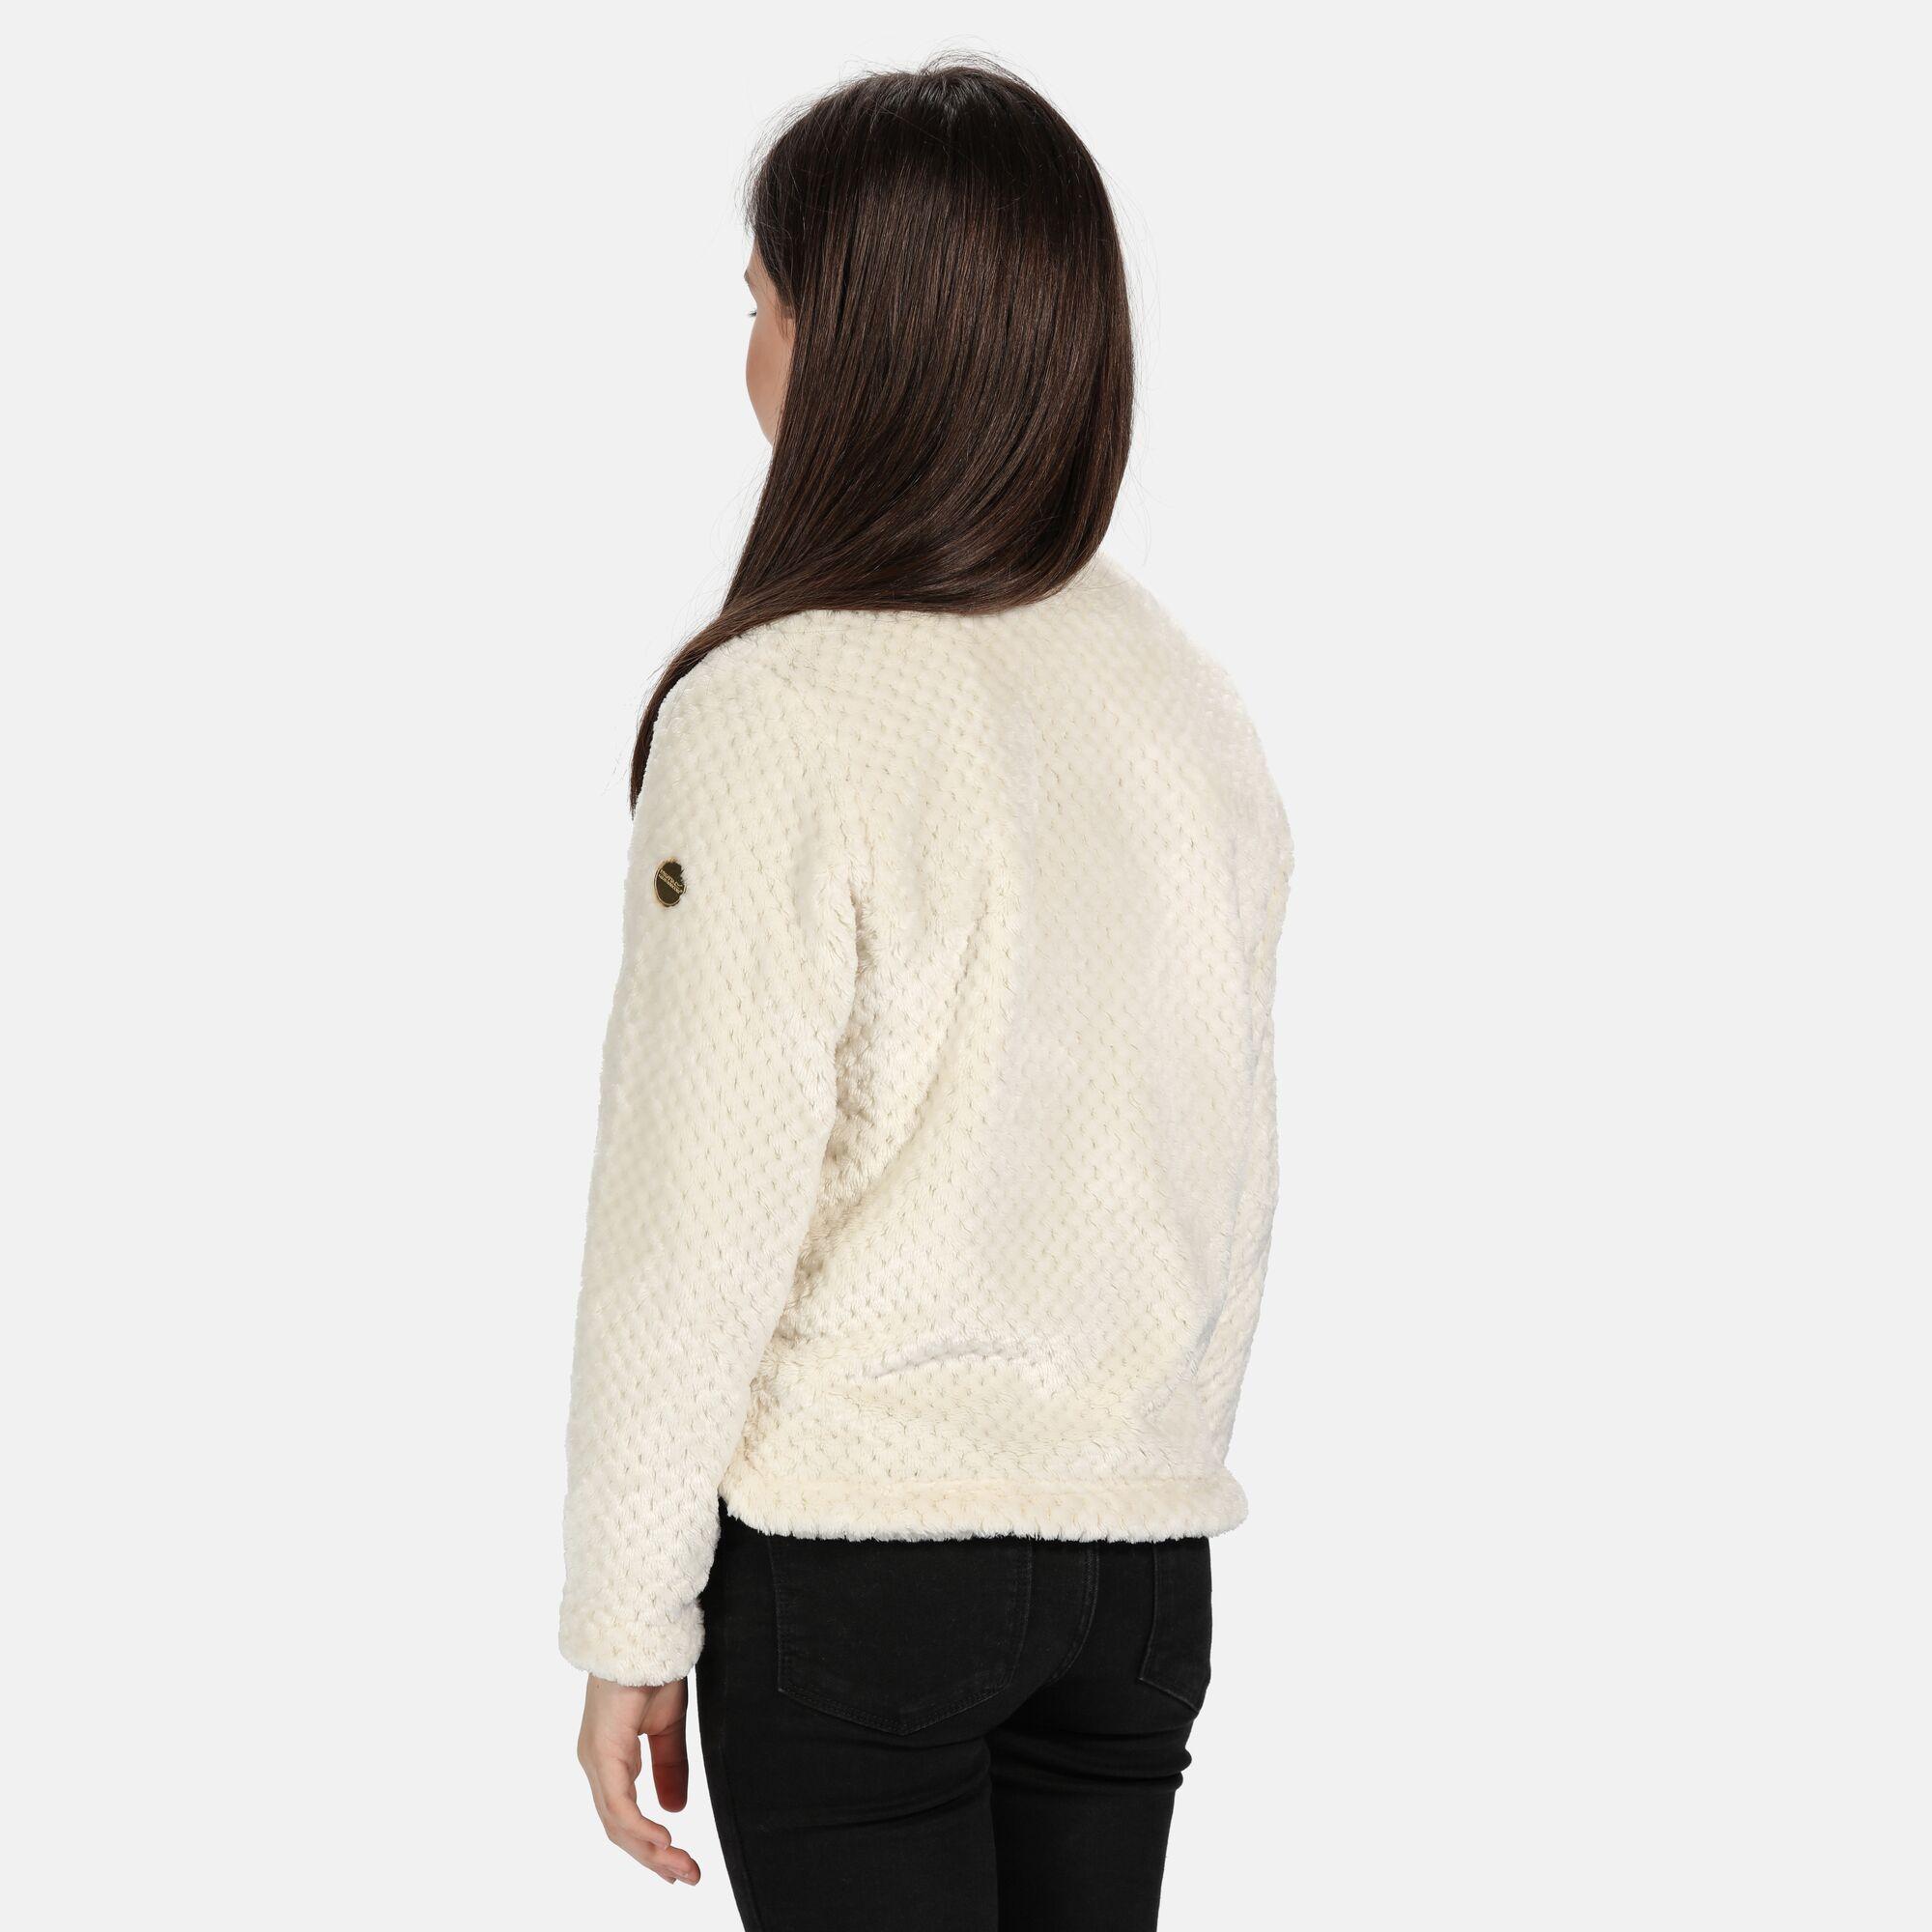 Regatta Childrens/Kids Kessie Half Zip Fleece Top (Light Vanilla)